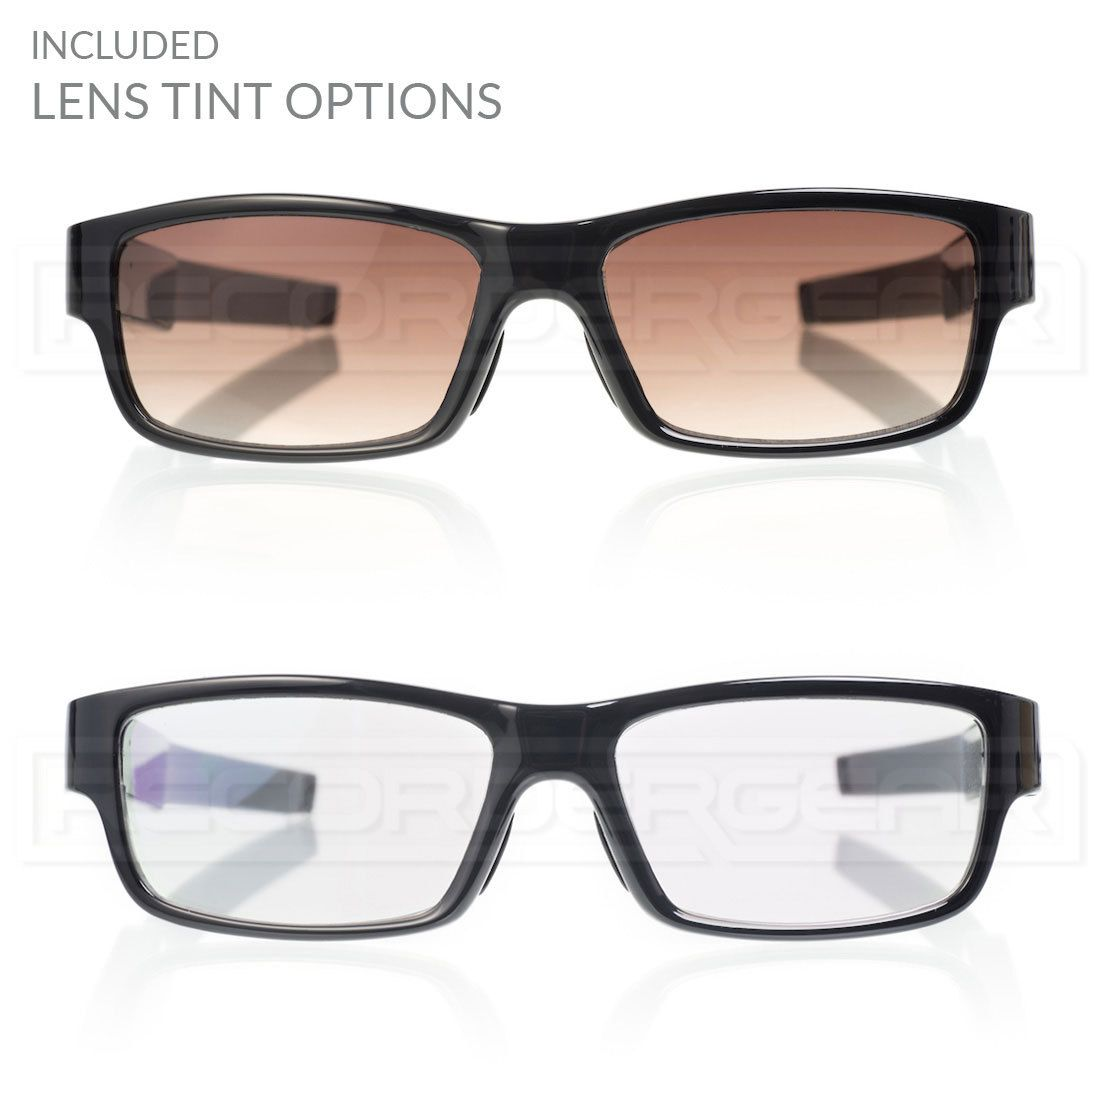 CG1000 1080P Professional Spy Camera Glasses | I'd like to